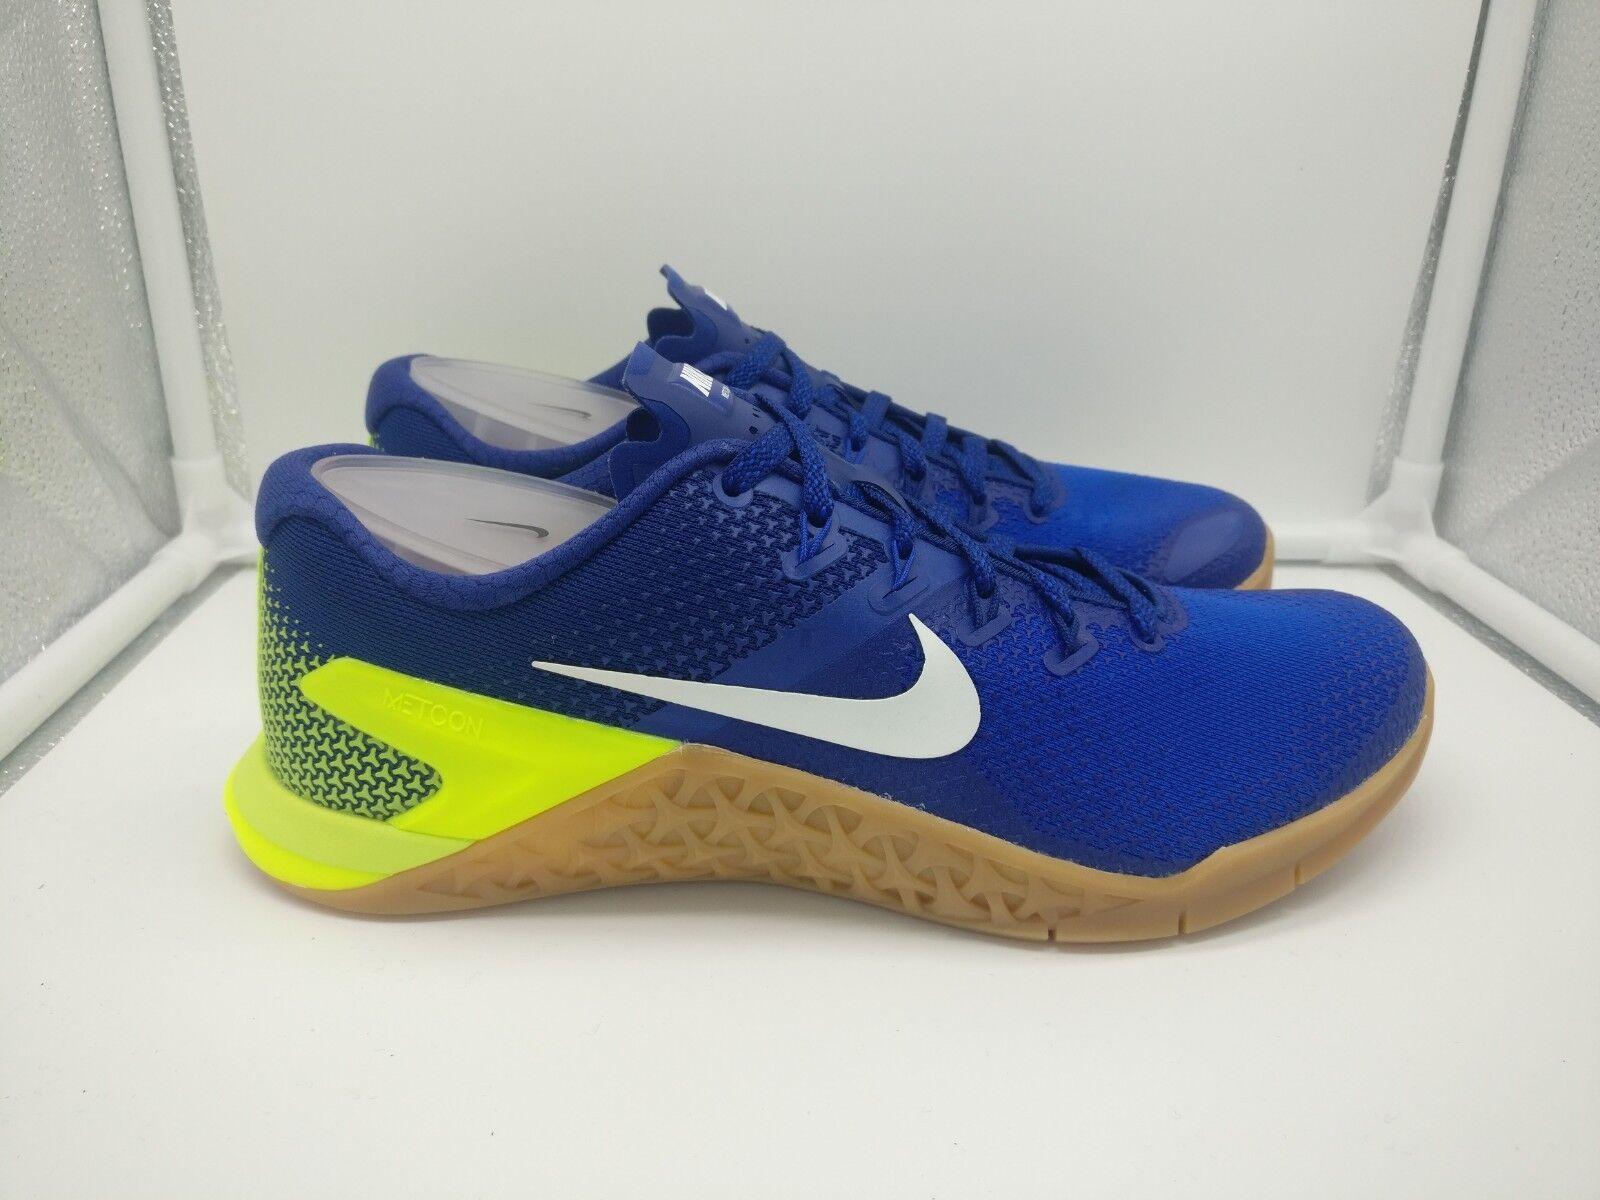 Nike Metcon 4 UK 6 Blau Volt Weiß Racer Blau Gum Med braun AH7453-701